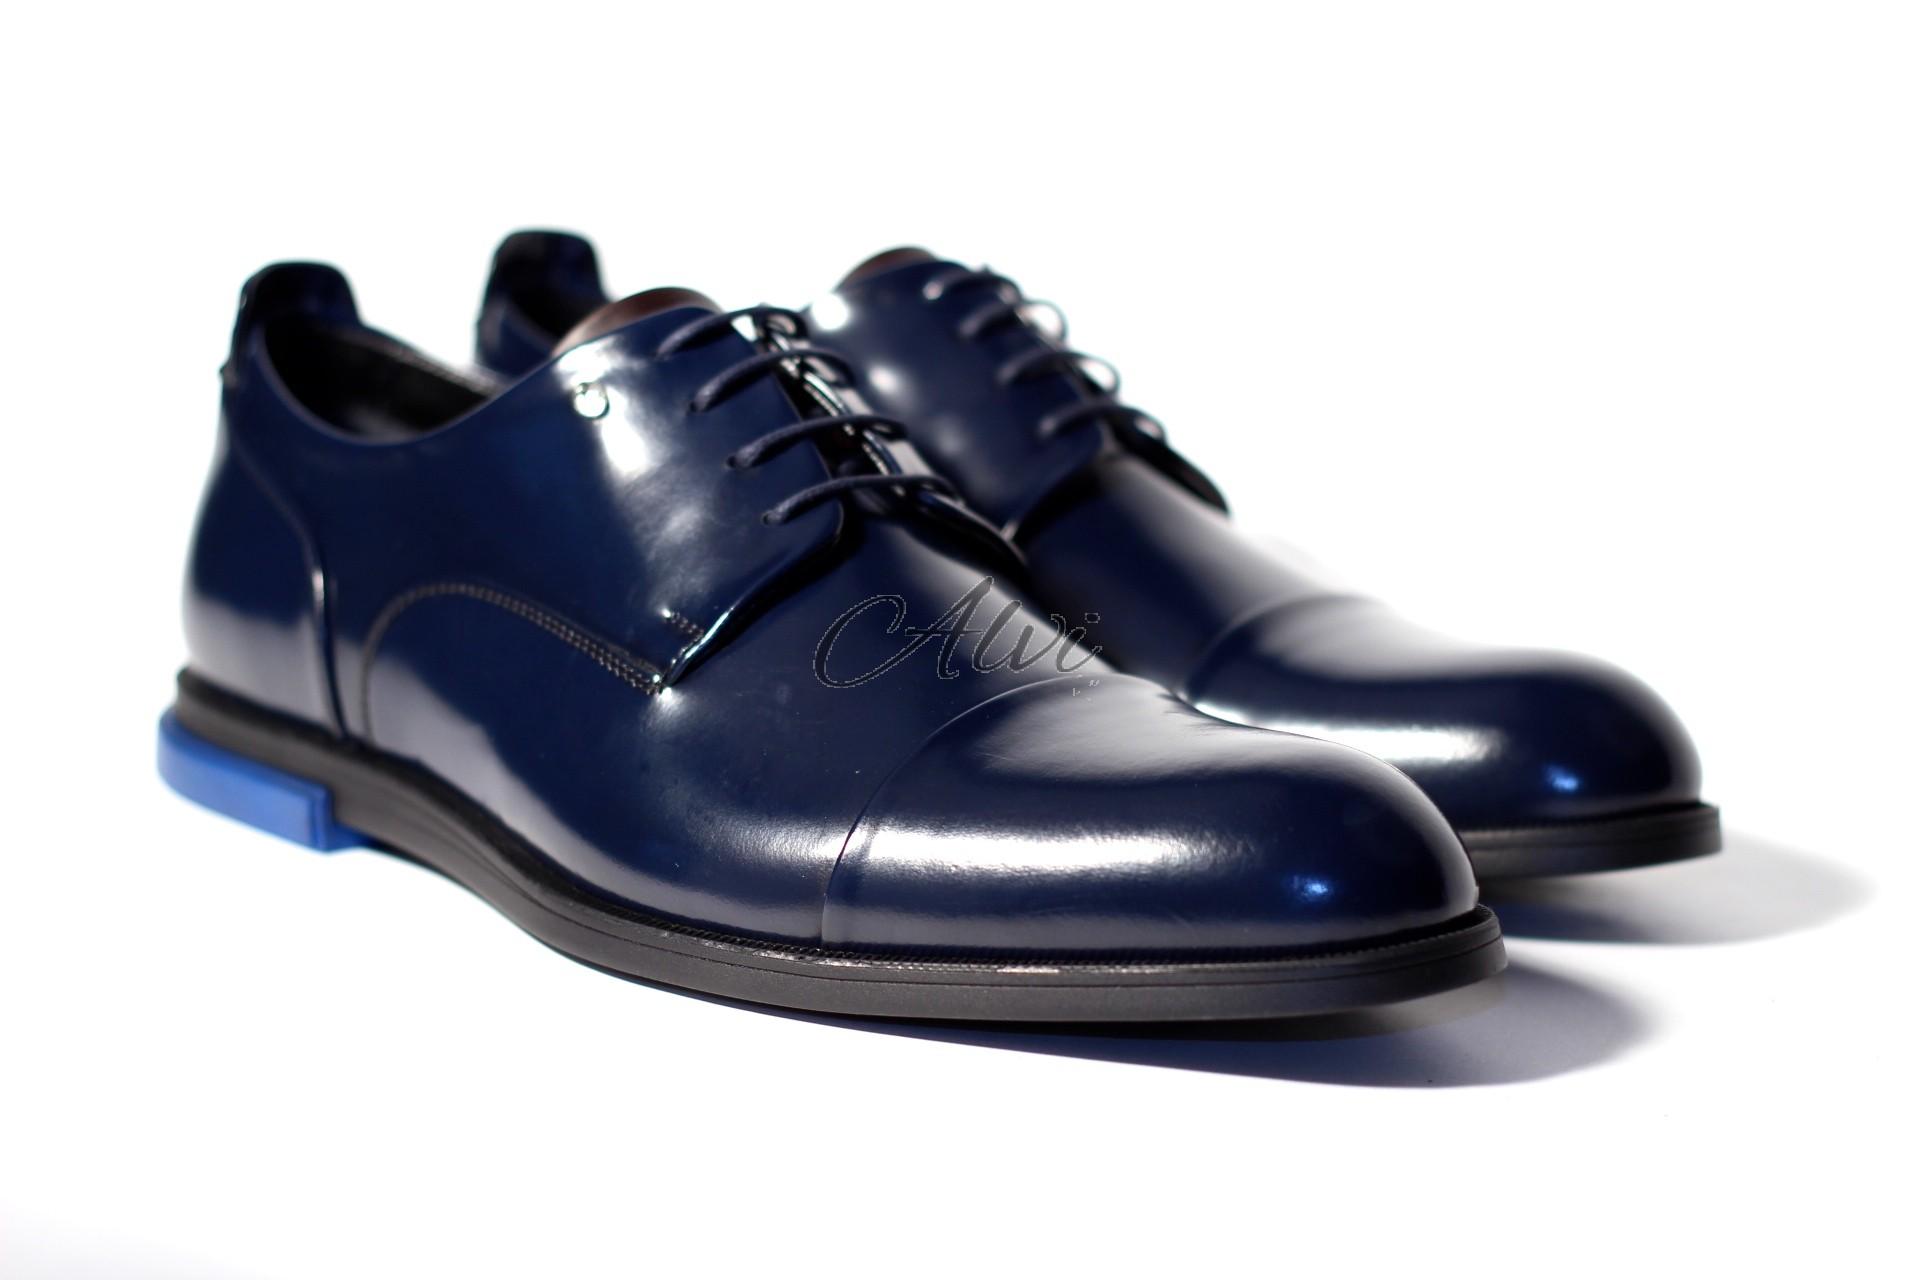 Scarpe maschili allacciate blu notte con tacco blu elettrico cc4f1706d76